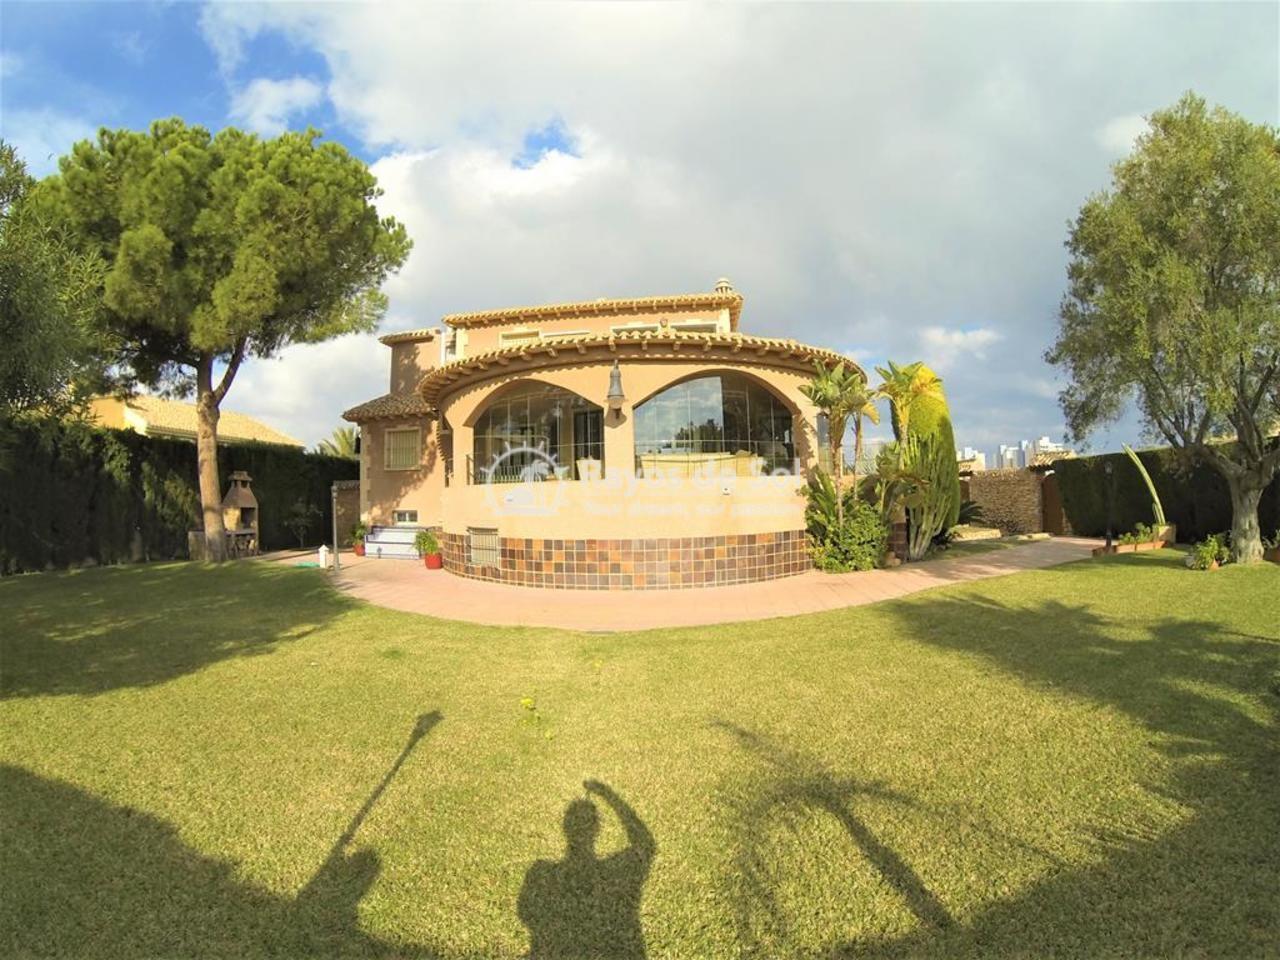 Villa  in La Manga del Mar Menor, Costa Cálida (533805sv) - 6